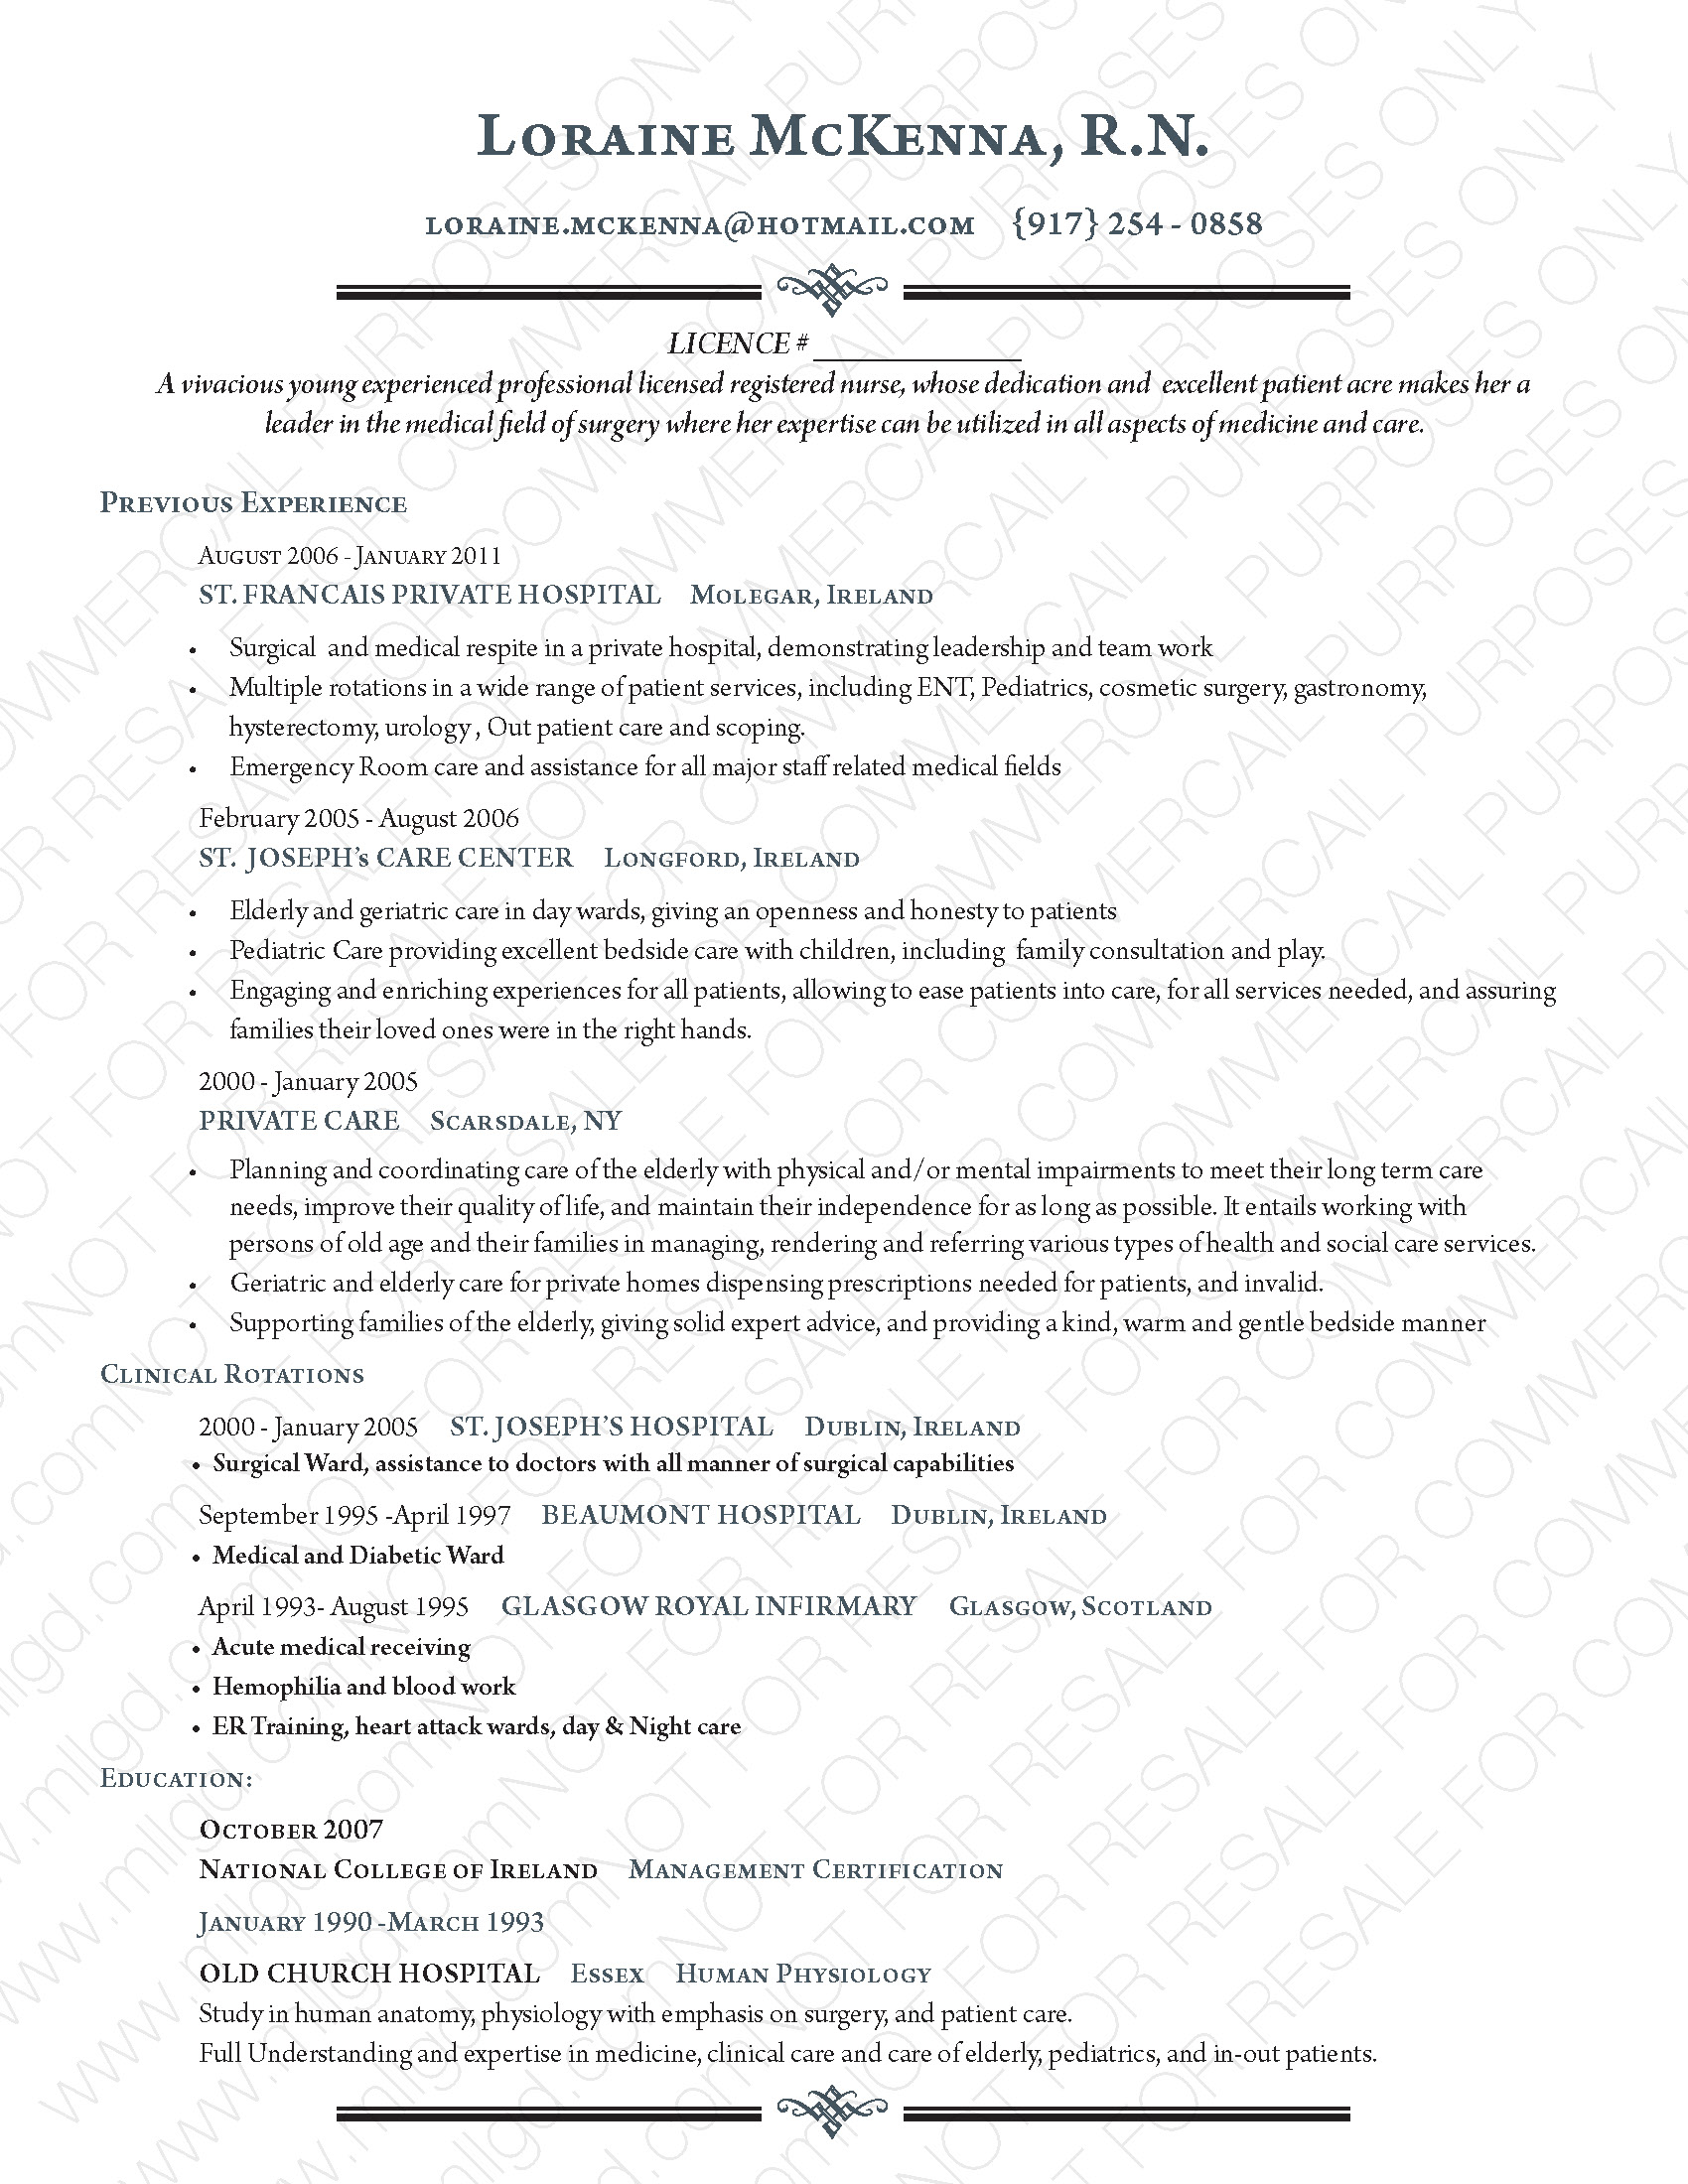 Mll_Resume_Design_2014_Page_18.jpg